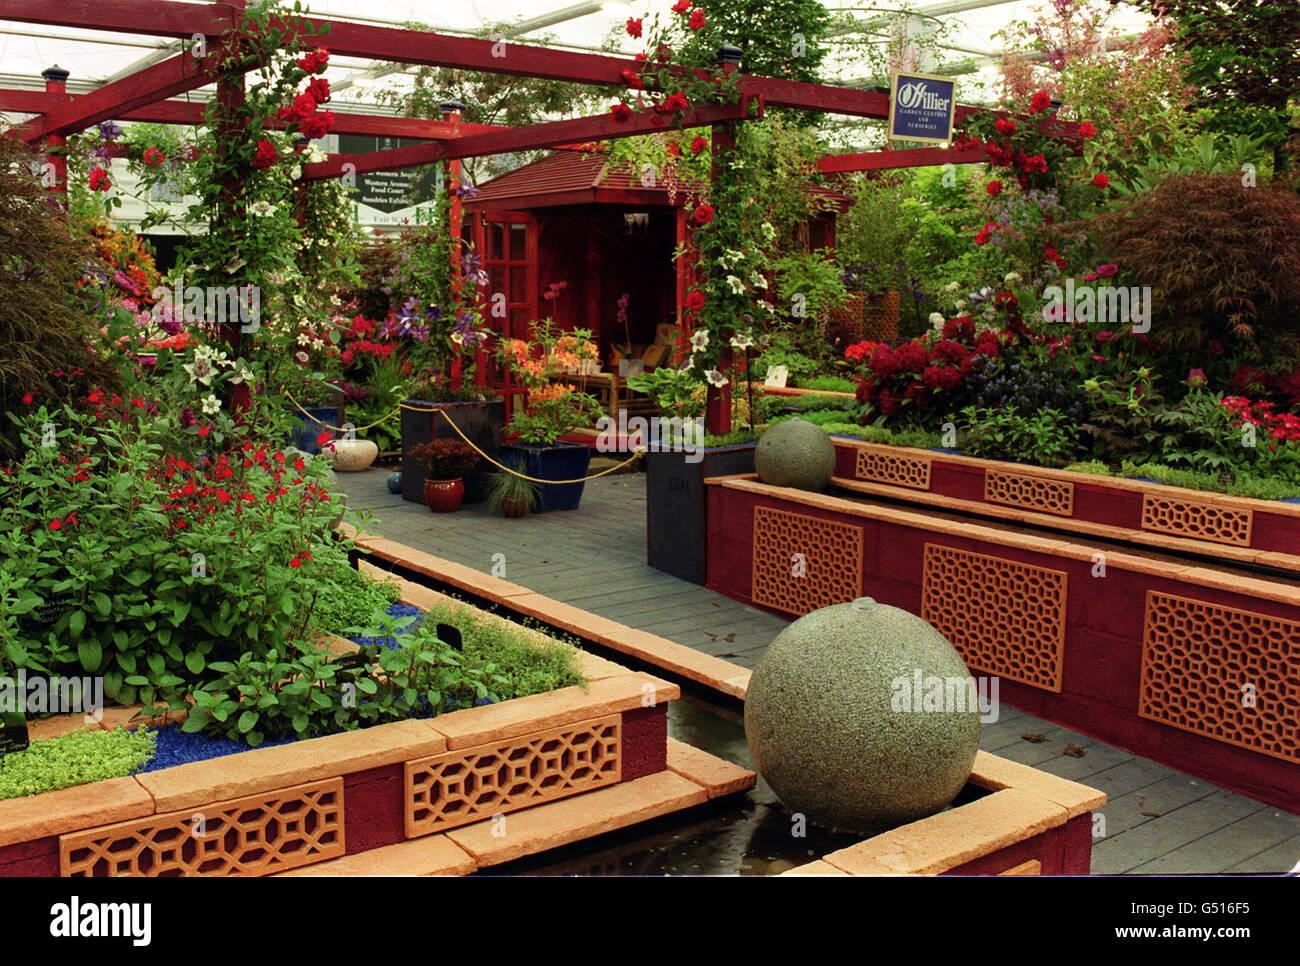 Chelsea garden award winners Stock Photo